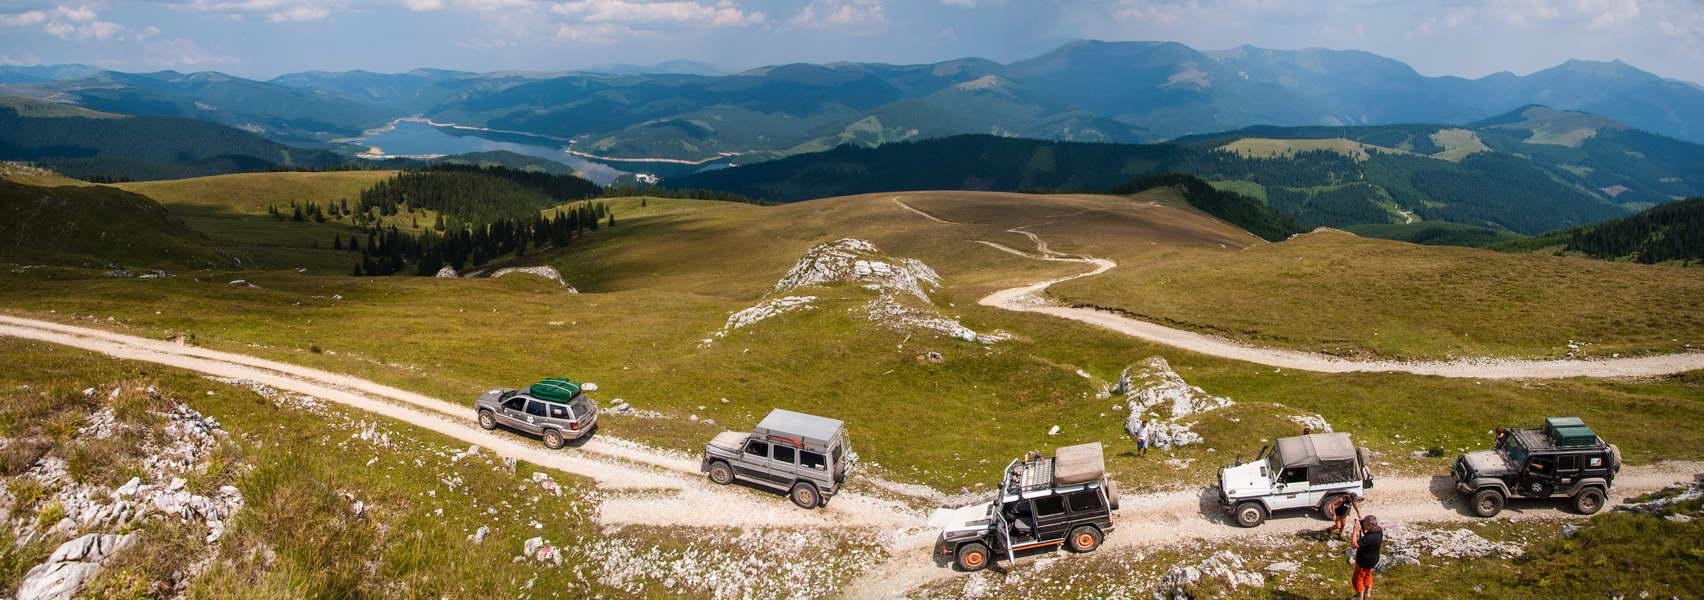 Rumunija_2015_169